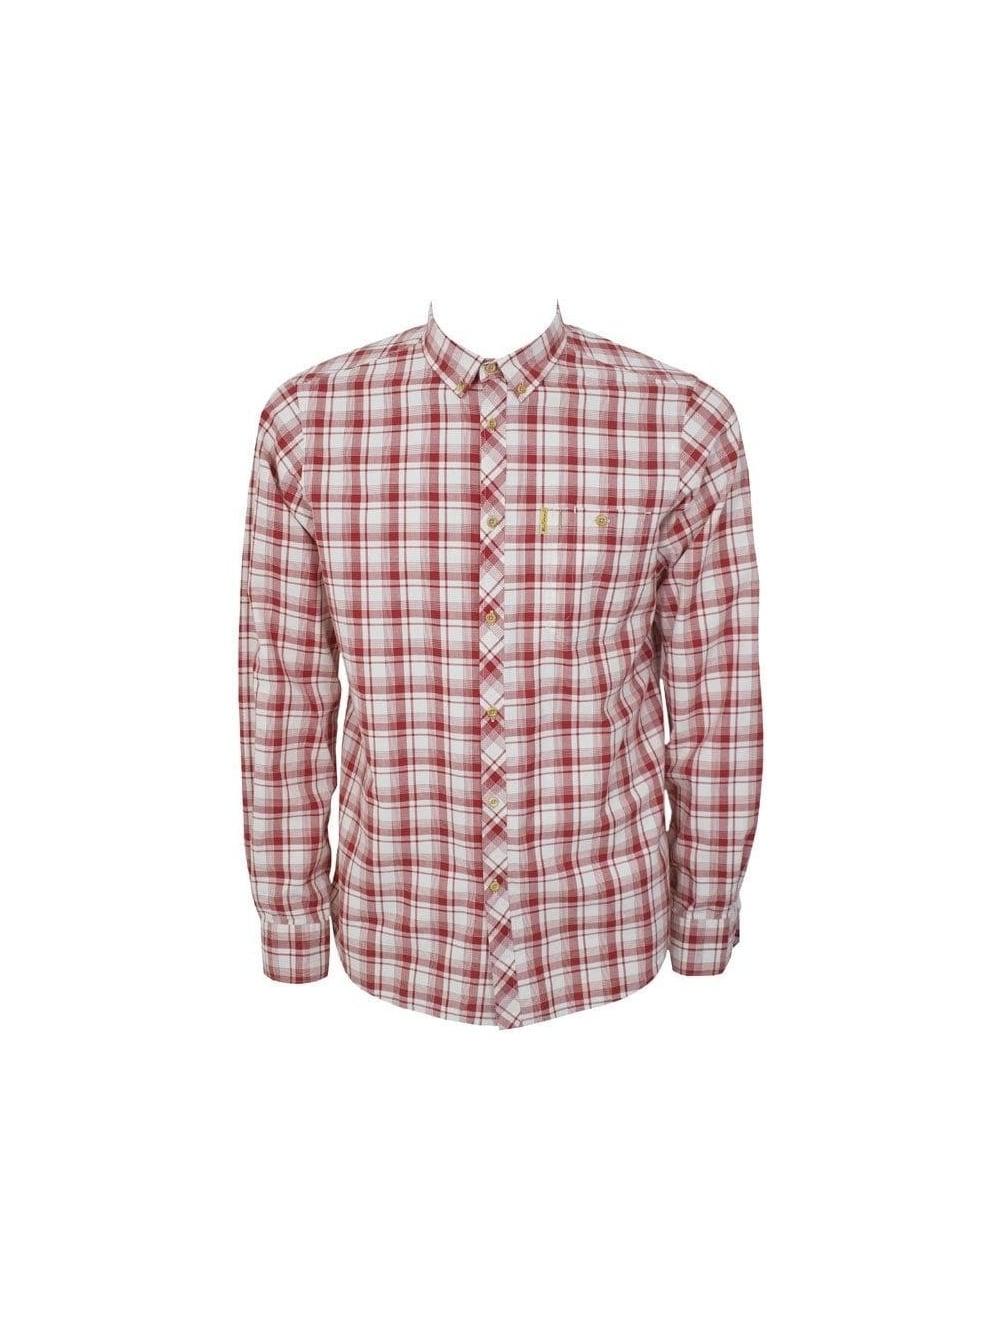 Ben sherman kensington shirt in starch northern threads for Starch on dress shirts